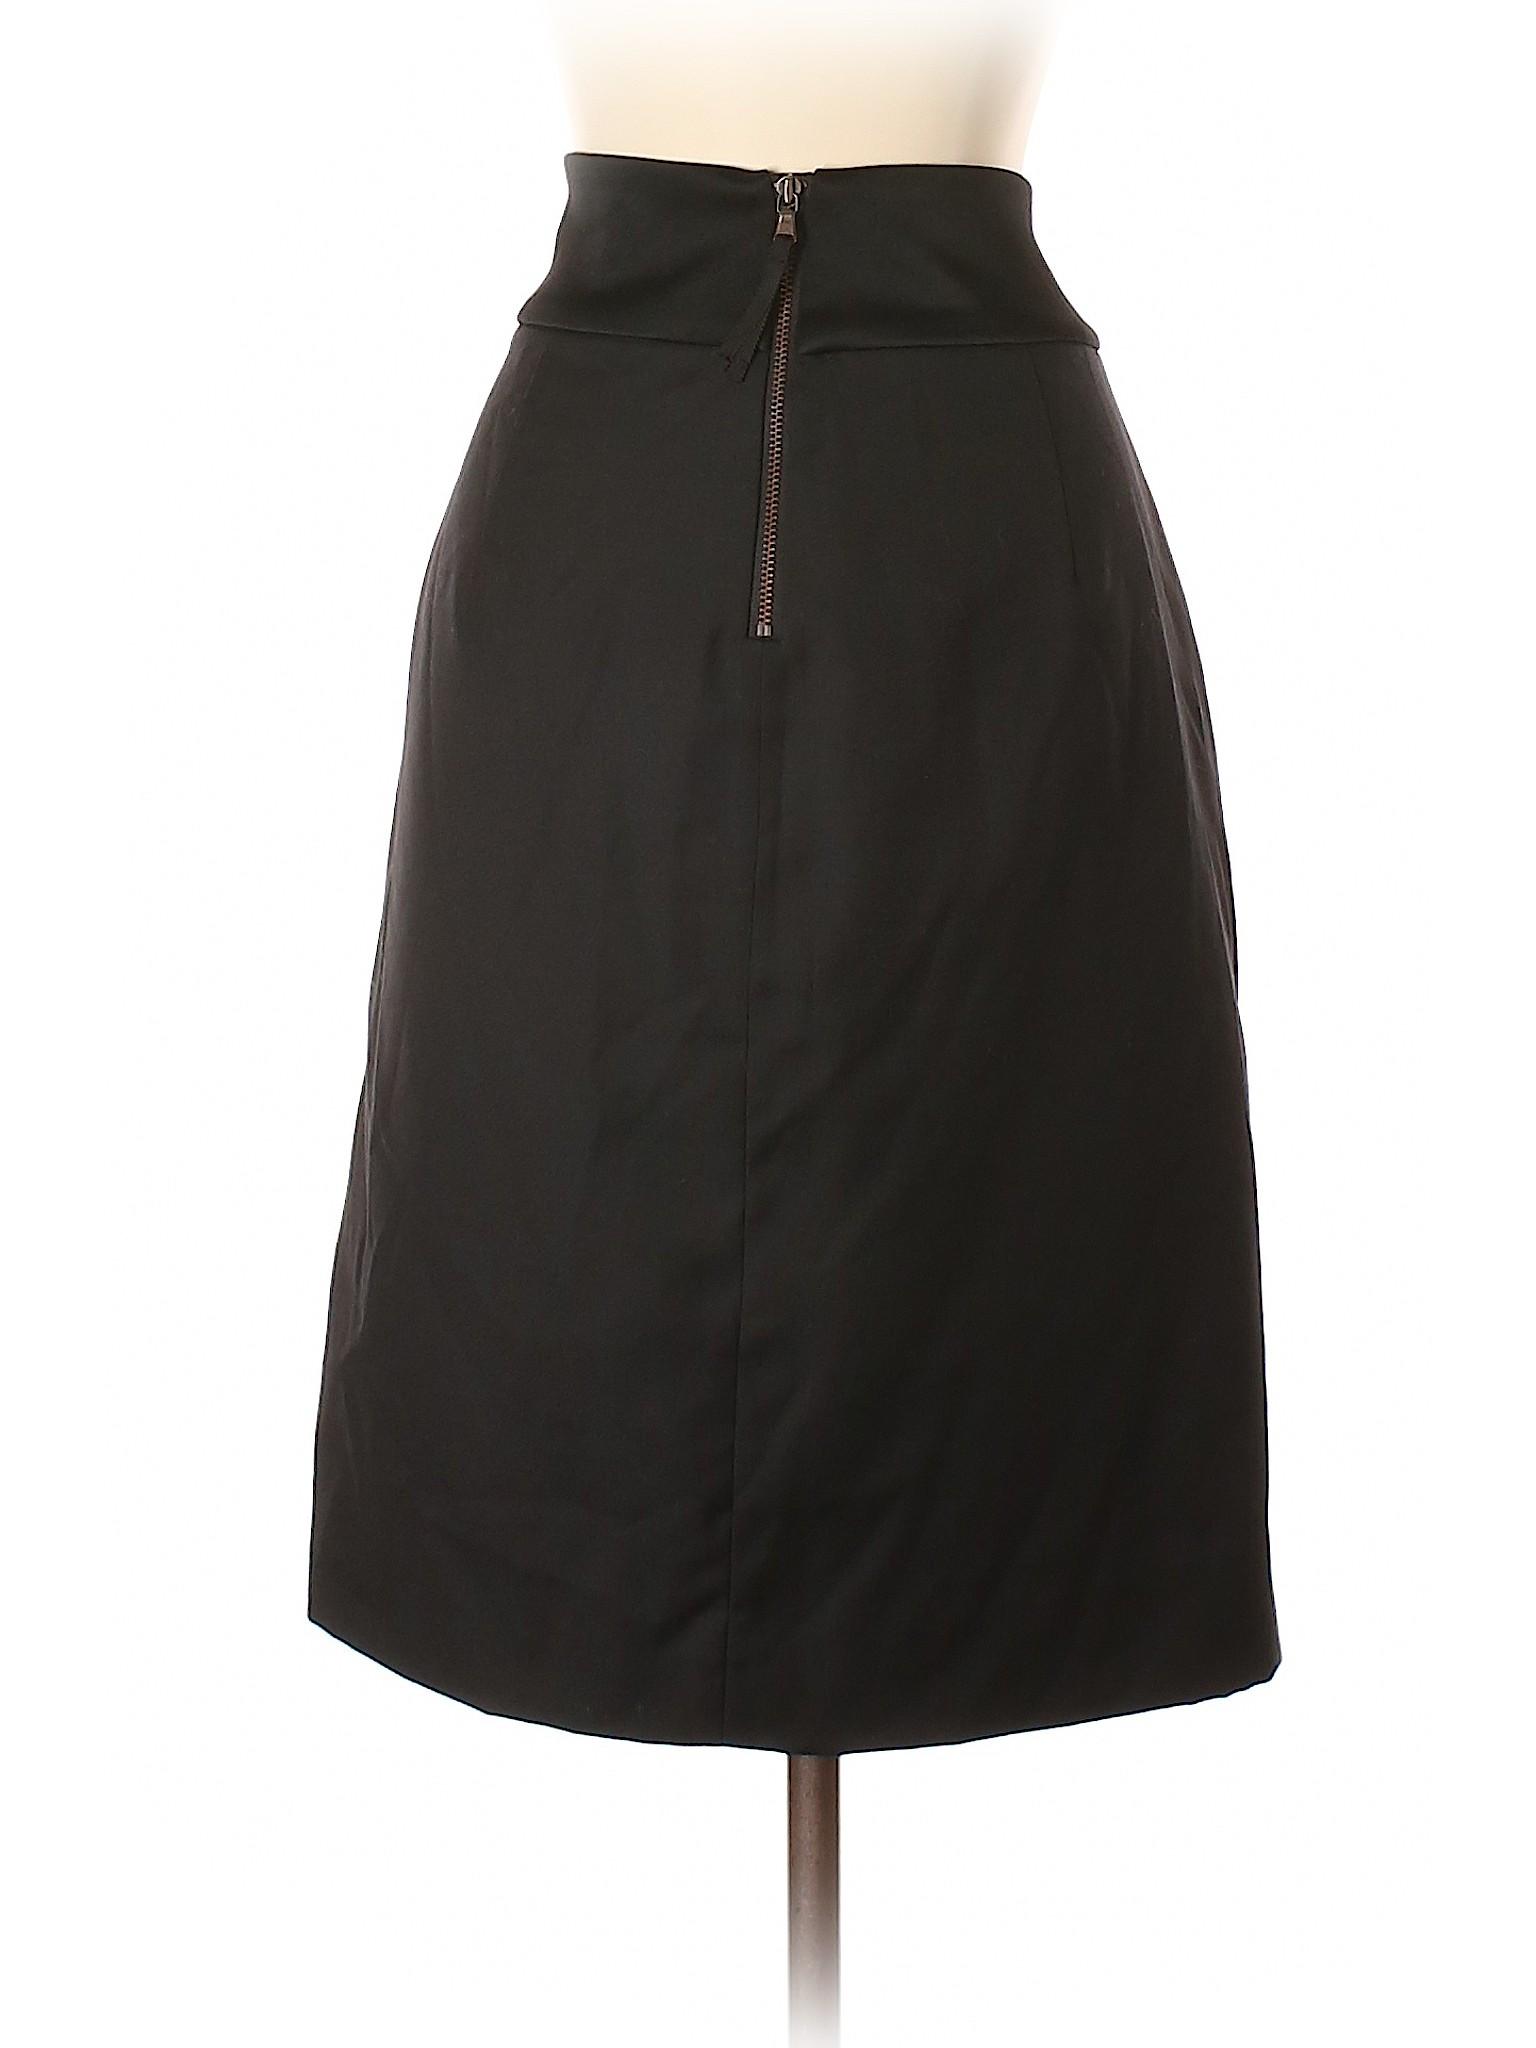 Boutique Wool Skirt Boutique Wool Zp0fBR